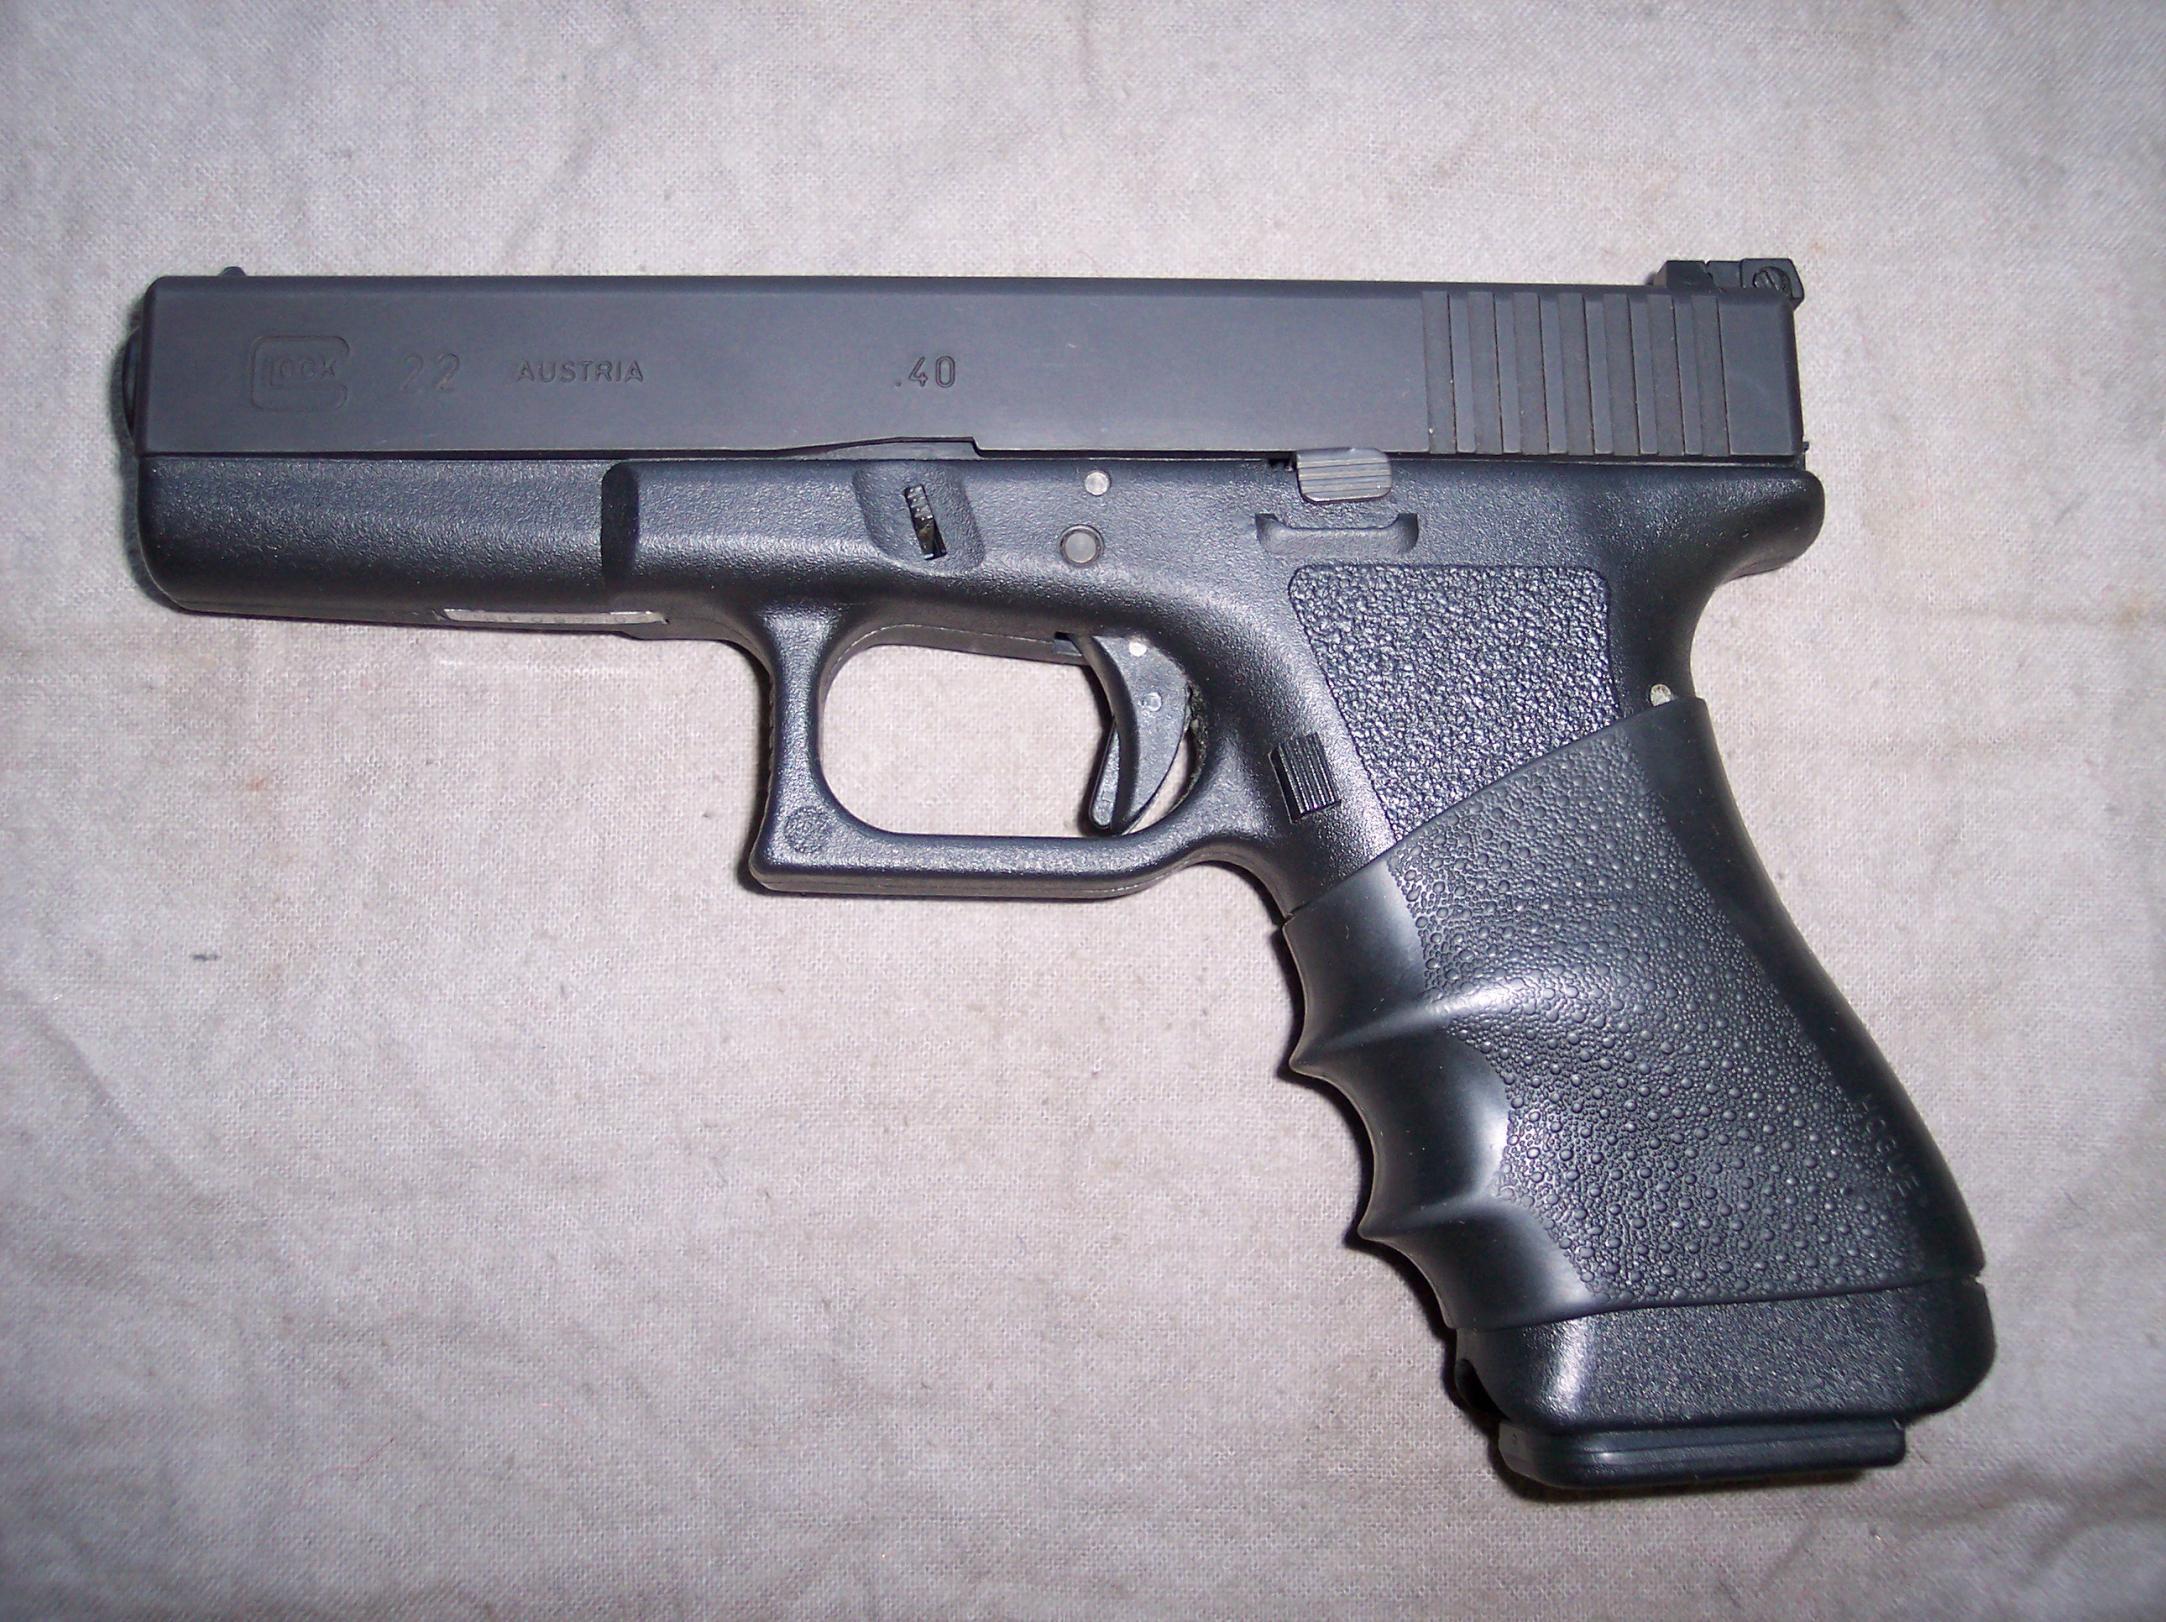 Glock 23 Gen 4 (pics for unbelievers)-glock-model-22-.40-s-w-.jpg